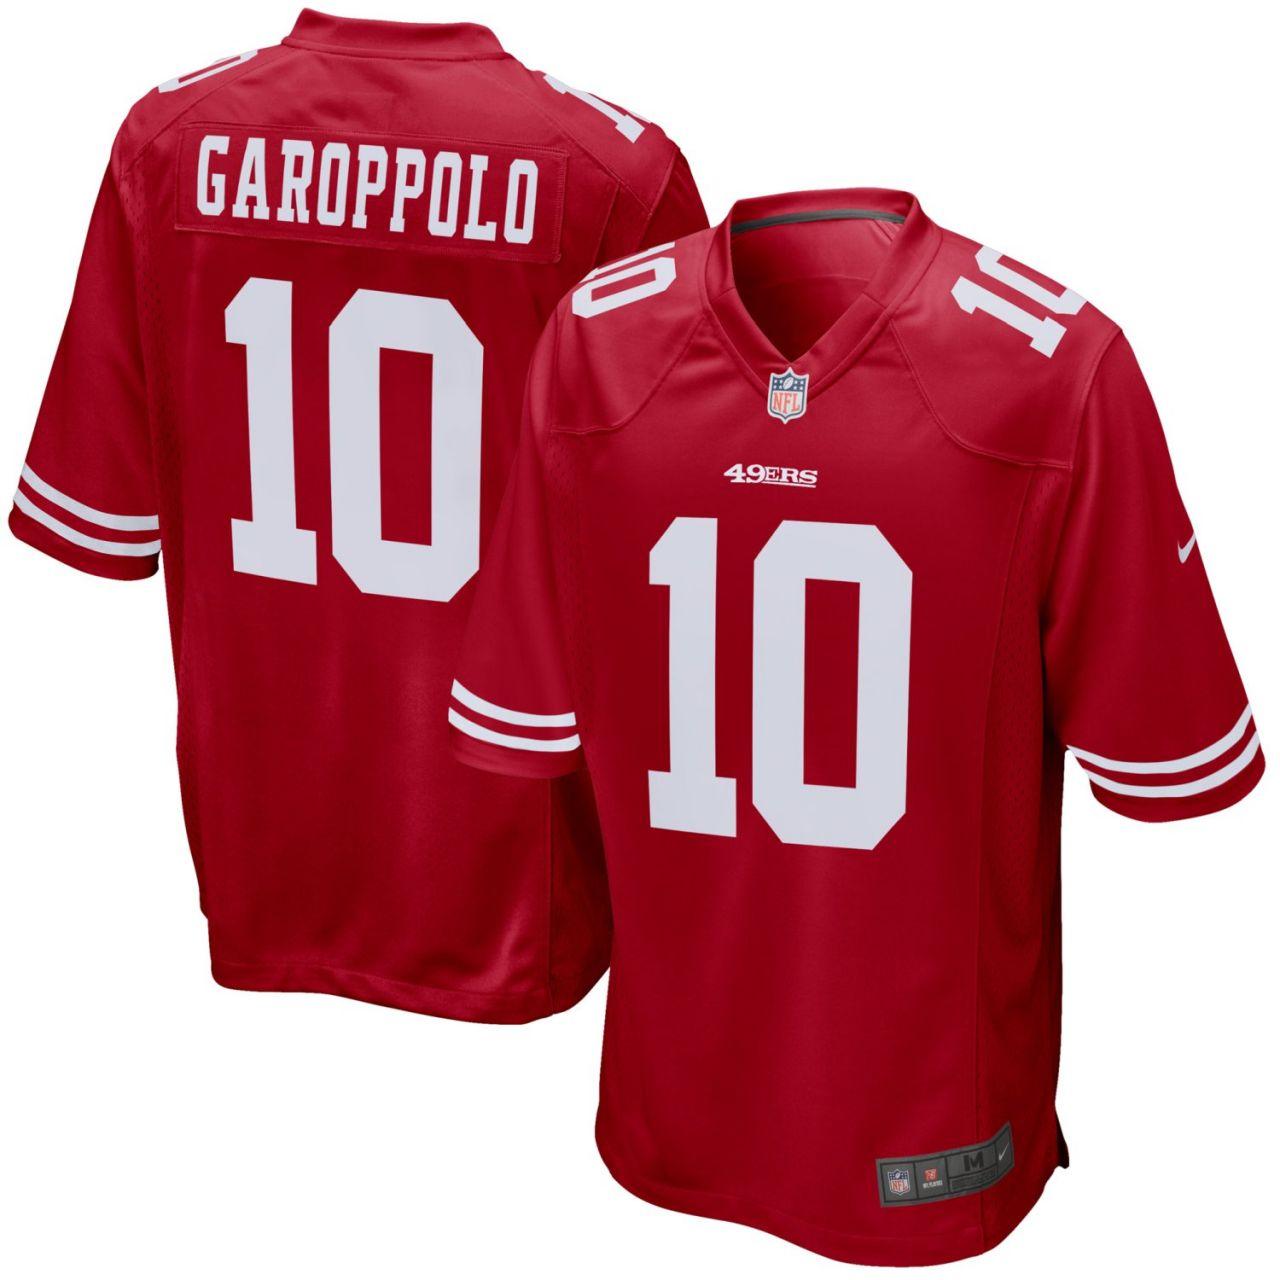 amfoo - Nike GAME Jersey San Francisco 49ers #10 Jimmy Garoppolo